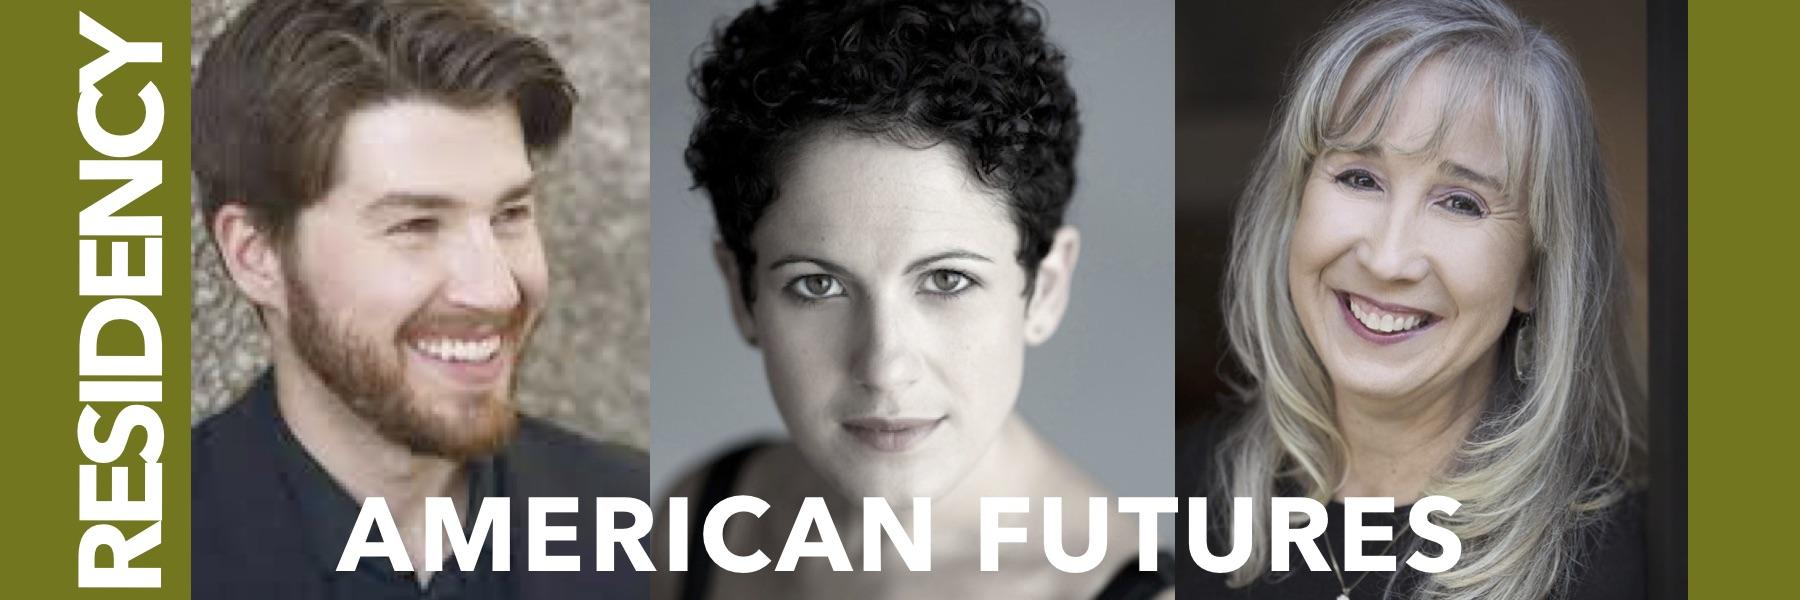 2020 American Futures.jpg